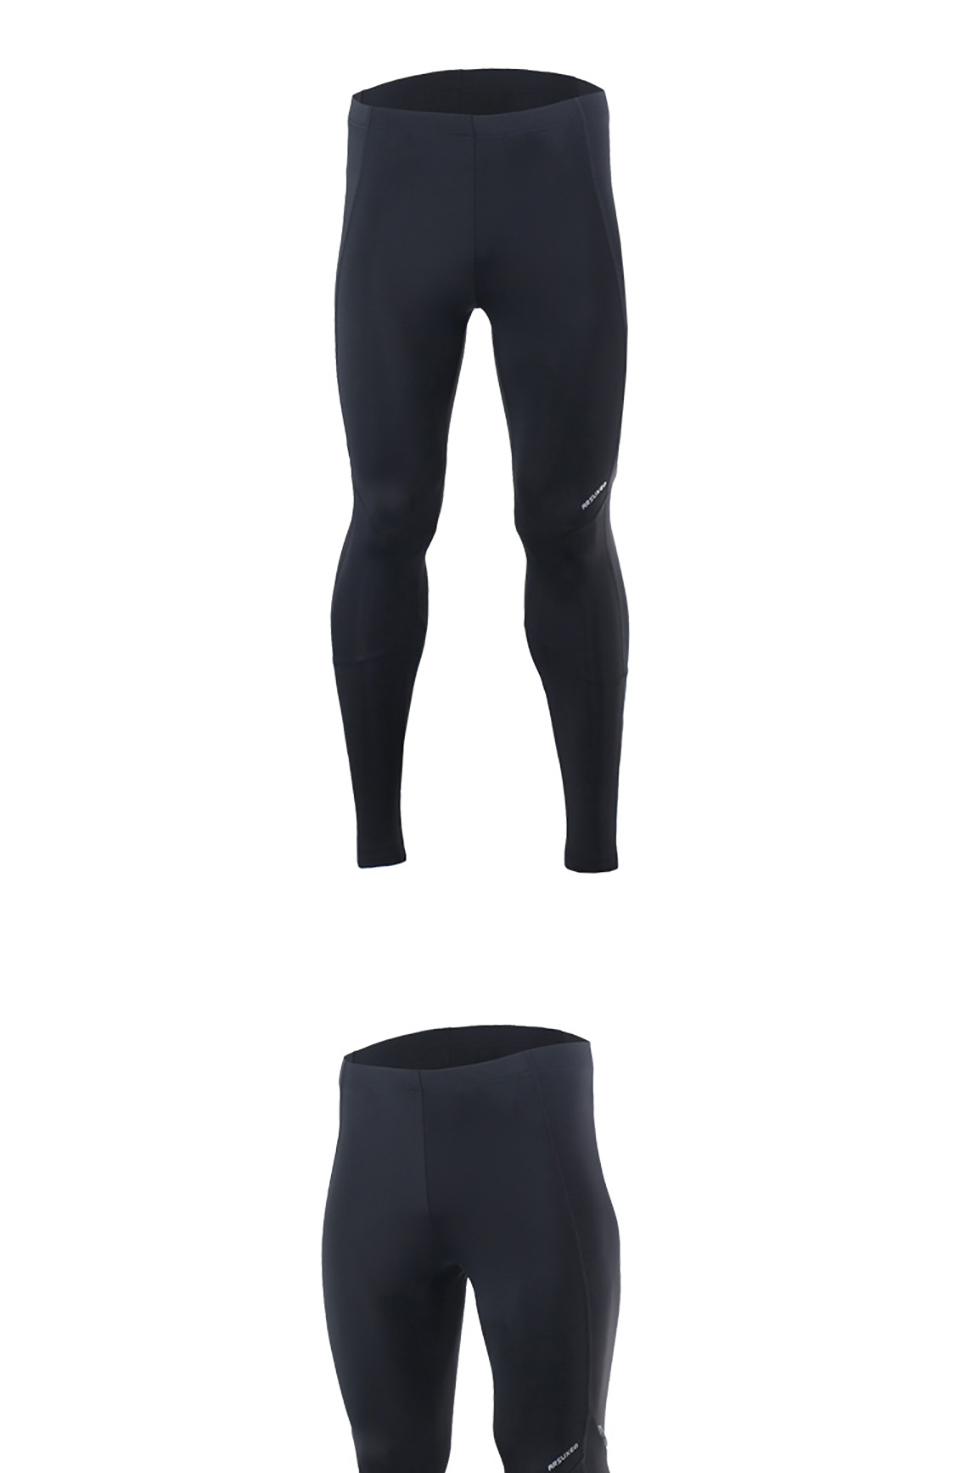 Mens Layered Shorts Leggings Pants Activewear Sports Jogging Running Gym Fitness